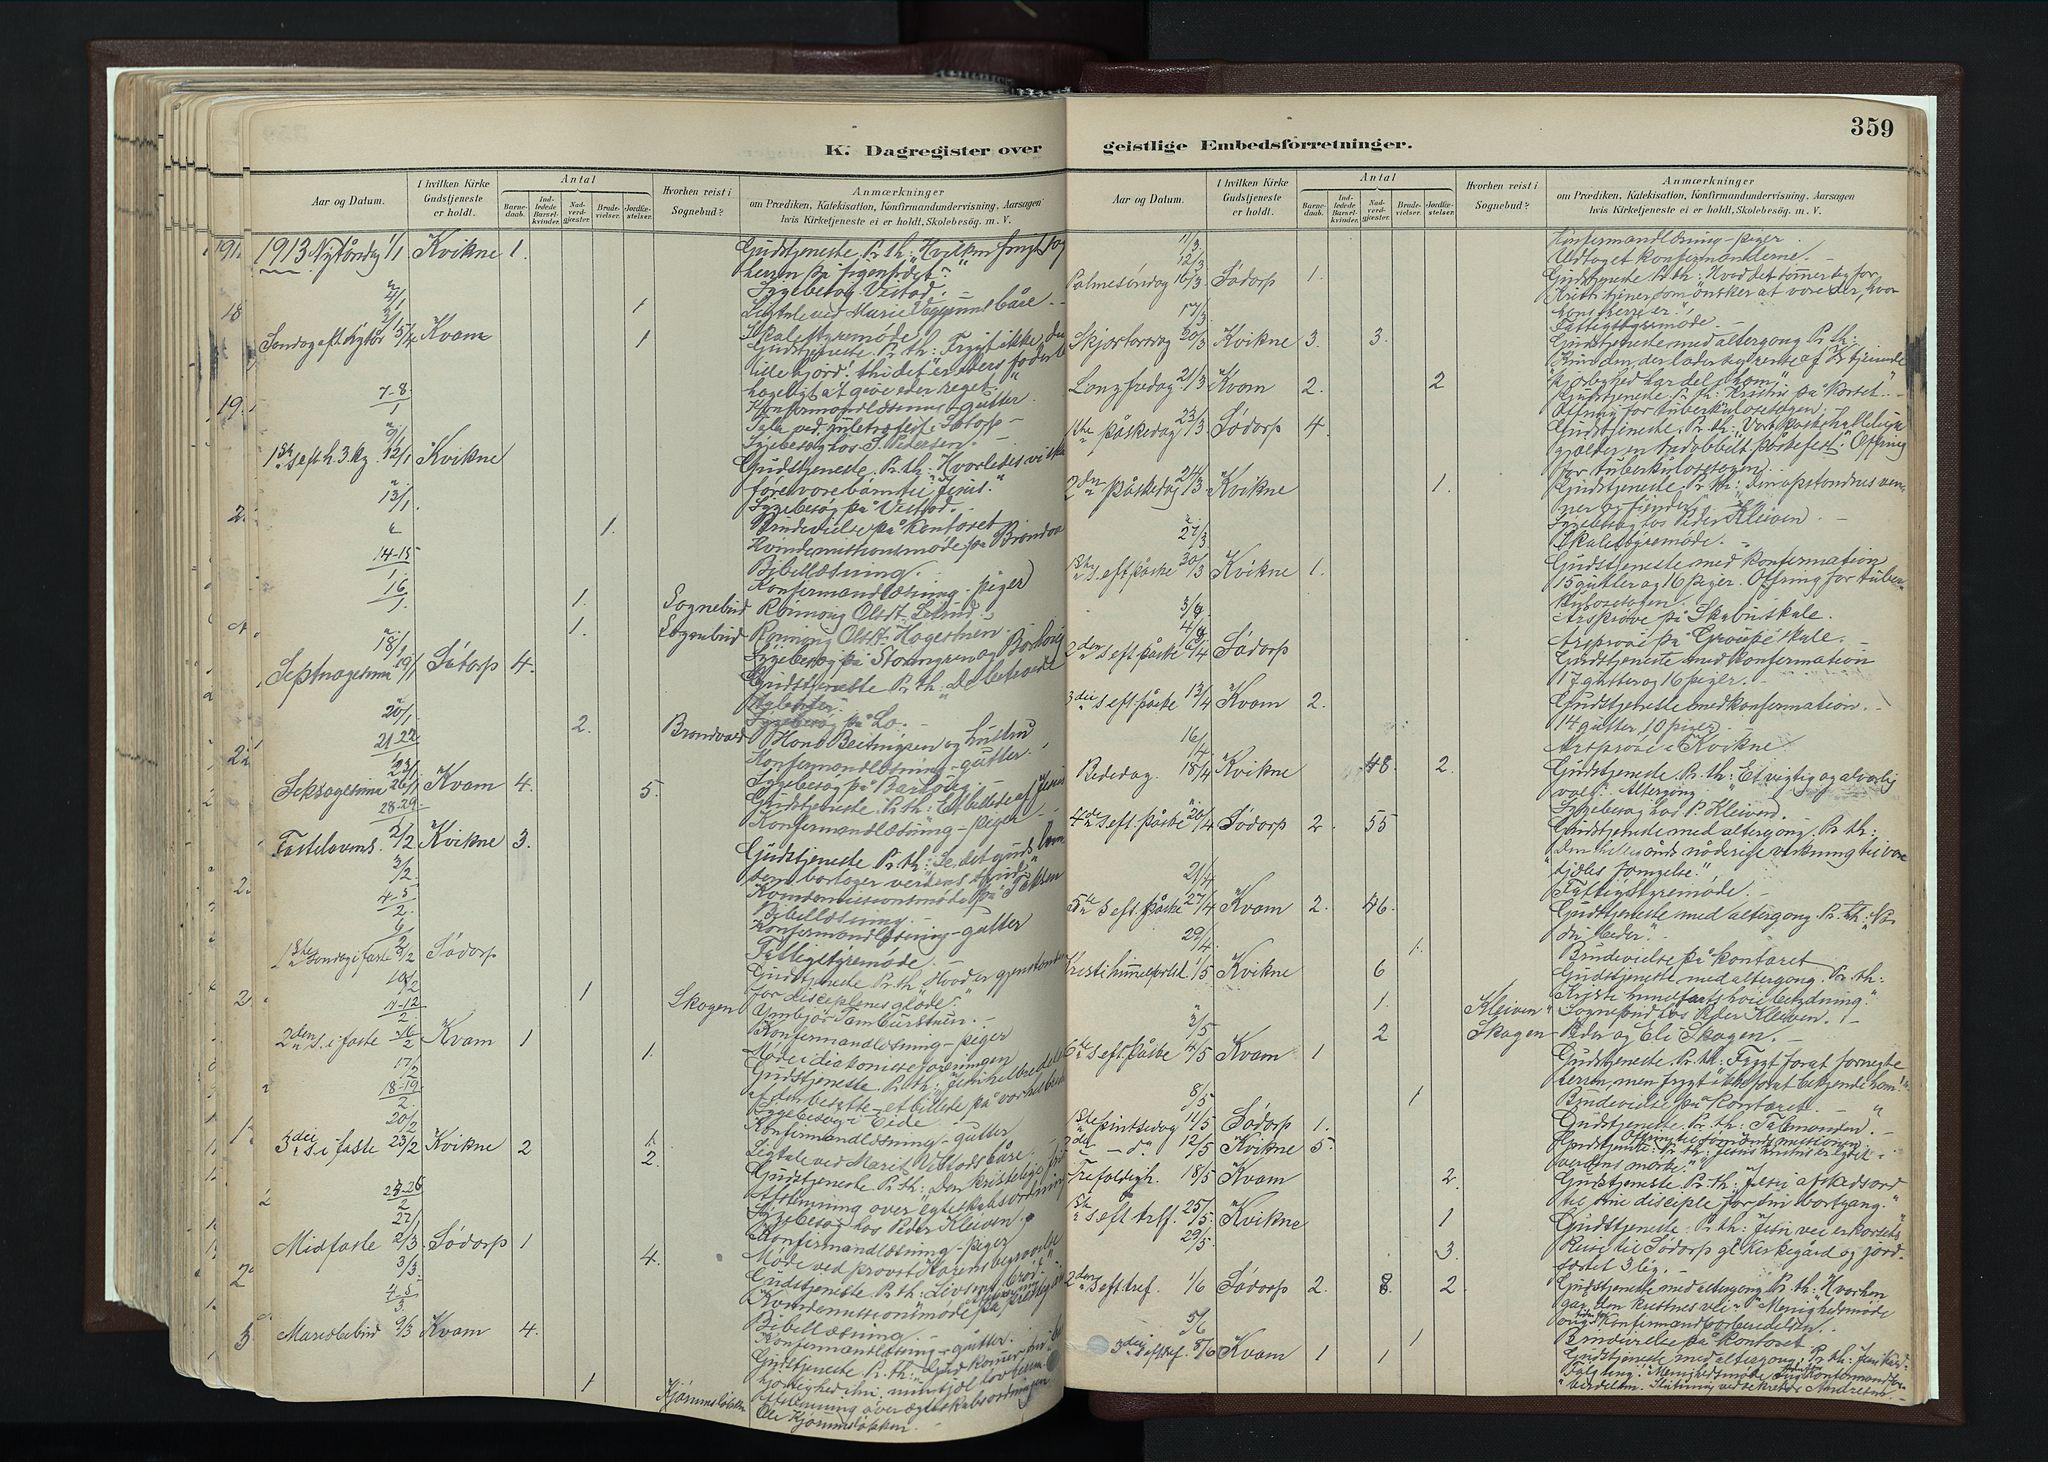 SAH, Nord-Fron prestekontor, Ministerialbok nr. 4, 1884-1914, s. 359